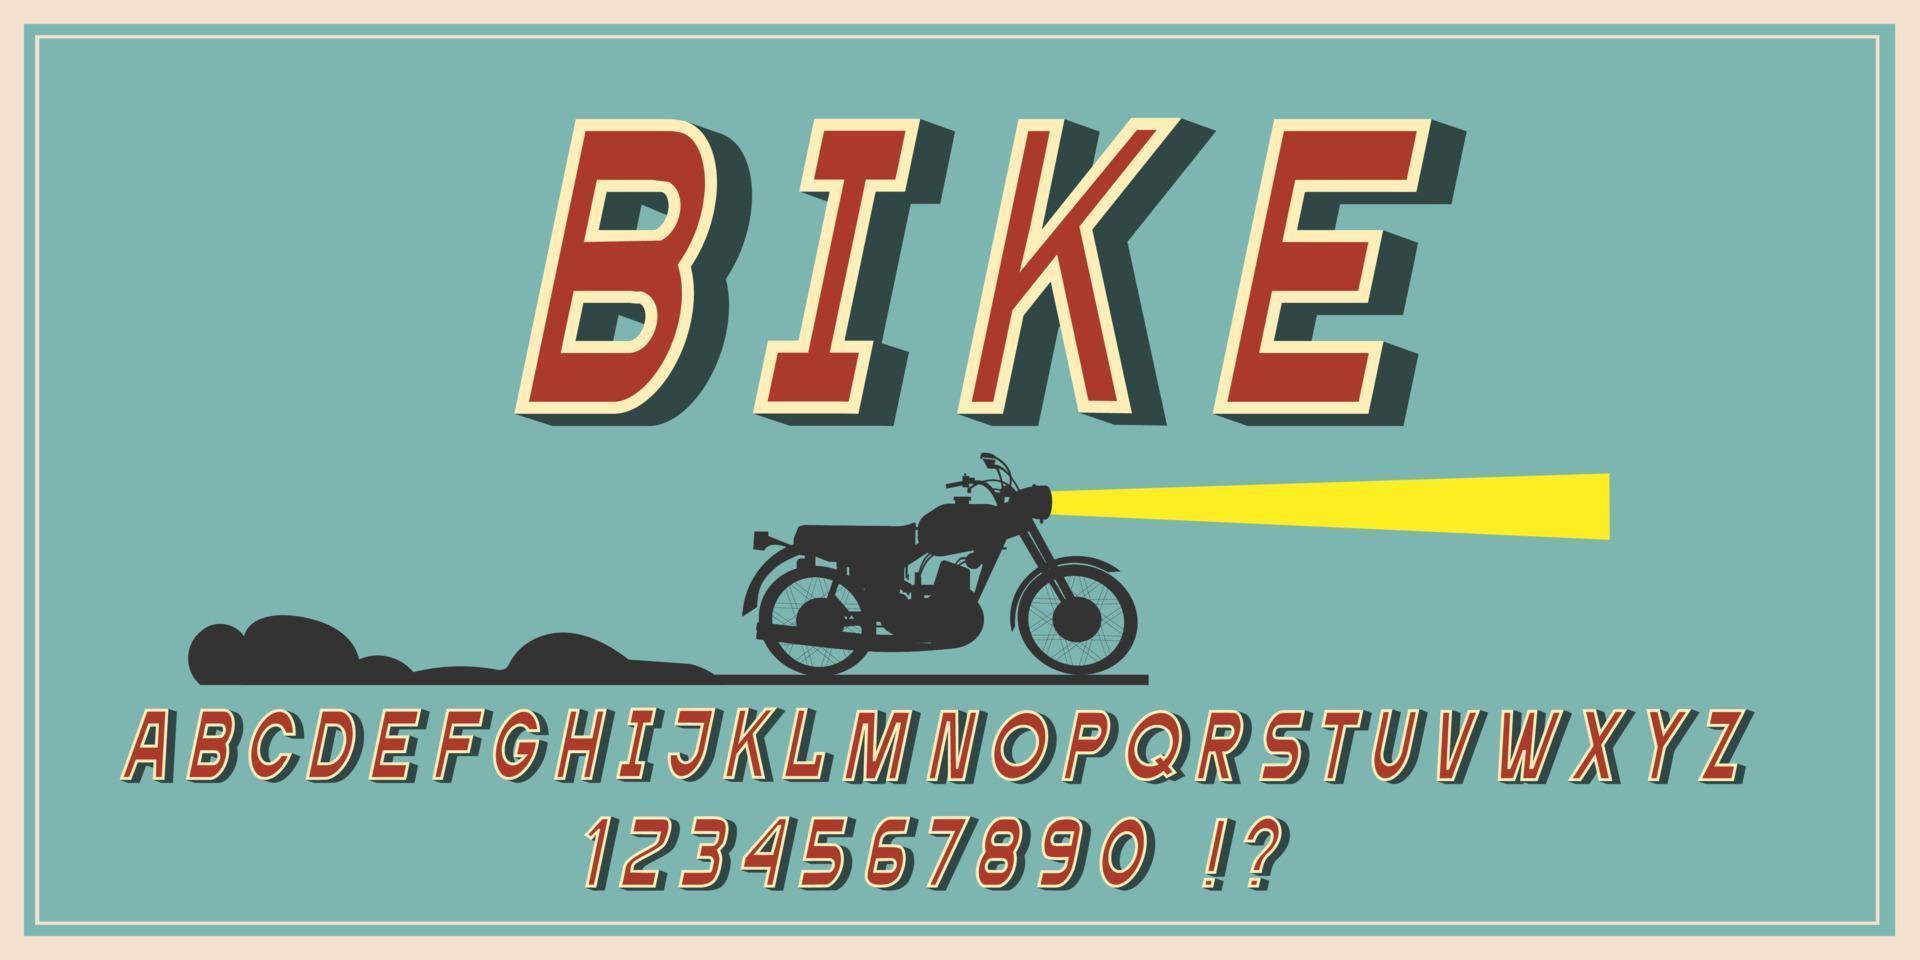 alfabeto, fonte vintage, letras e números retrô vetor